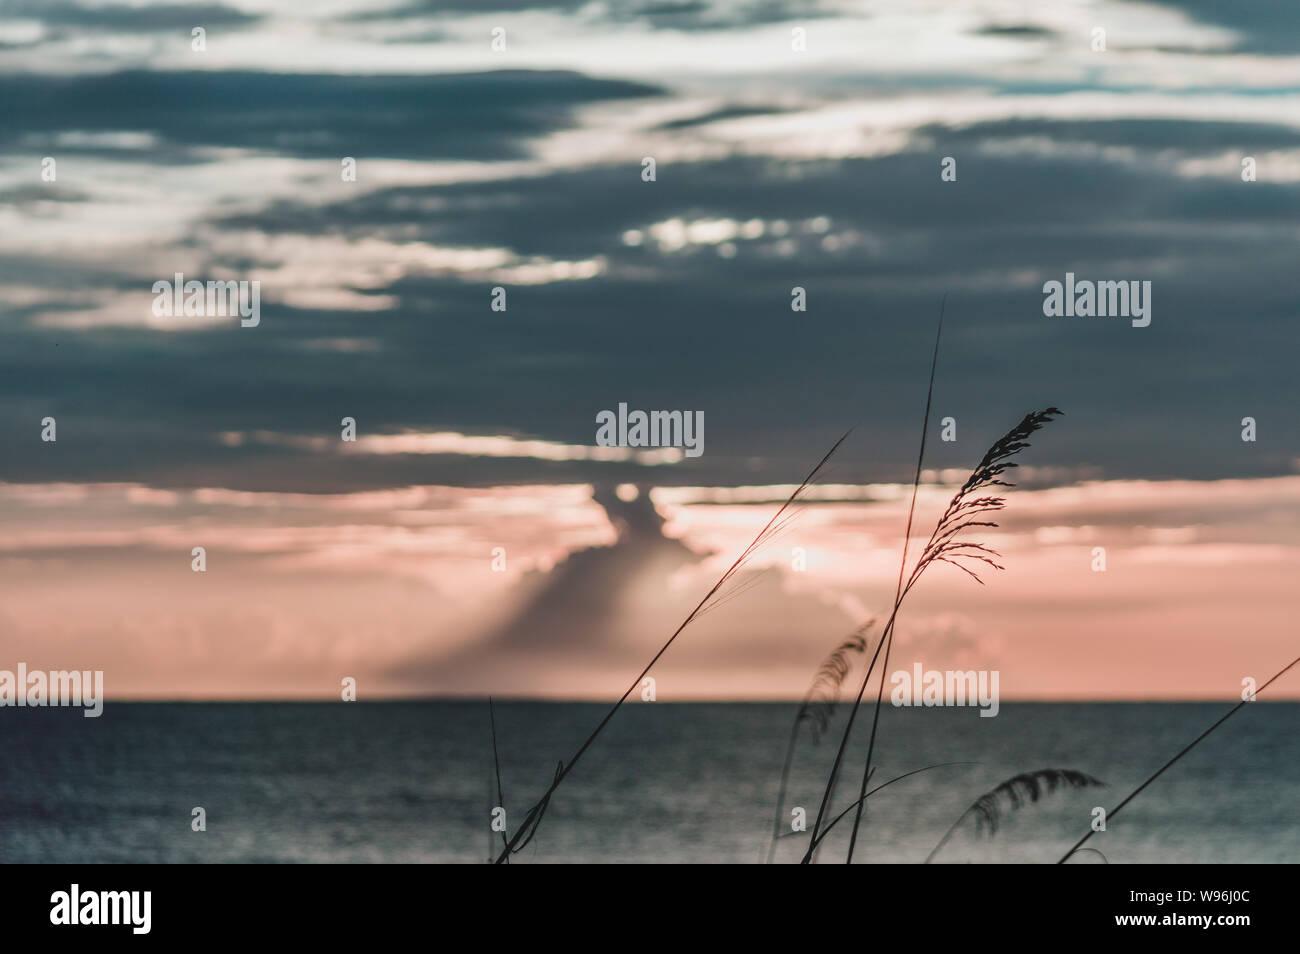 Grass reed enjoying sunset view Stock Photo